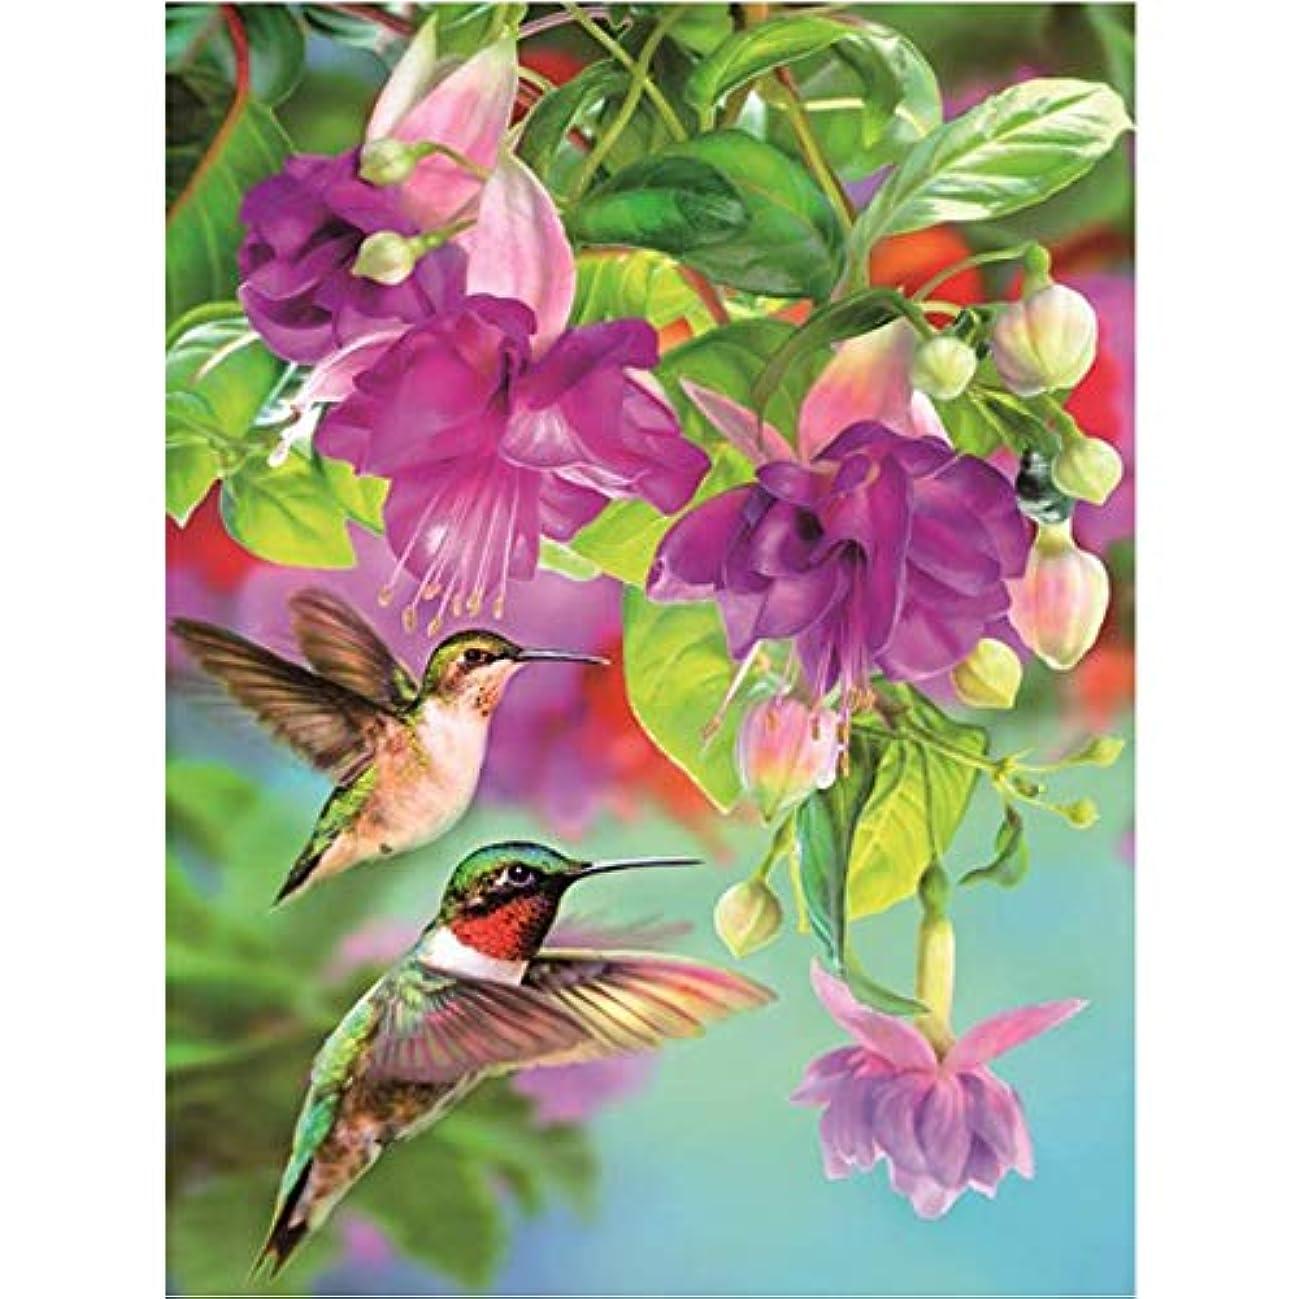 5D DIY Diamond Painting Full Drill Bird, Ginfonr Hummingbird Embroidery Rhinestone Paint with Diamonds Cross Stitch Wall Decoration Paintings Mosaic Home Decor 11.8x15.7inch (30x40cm)